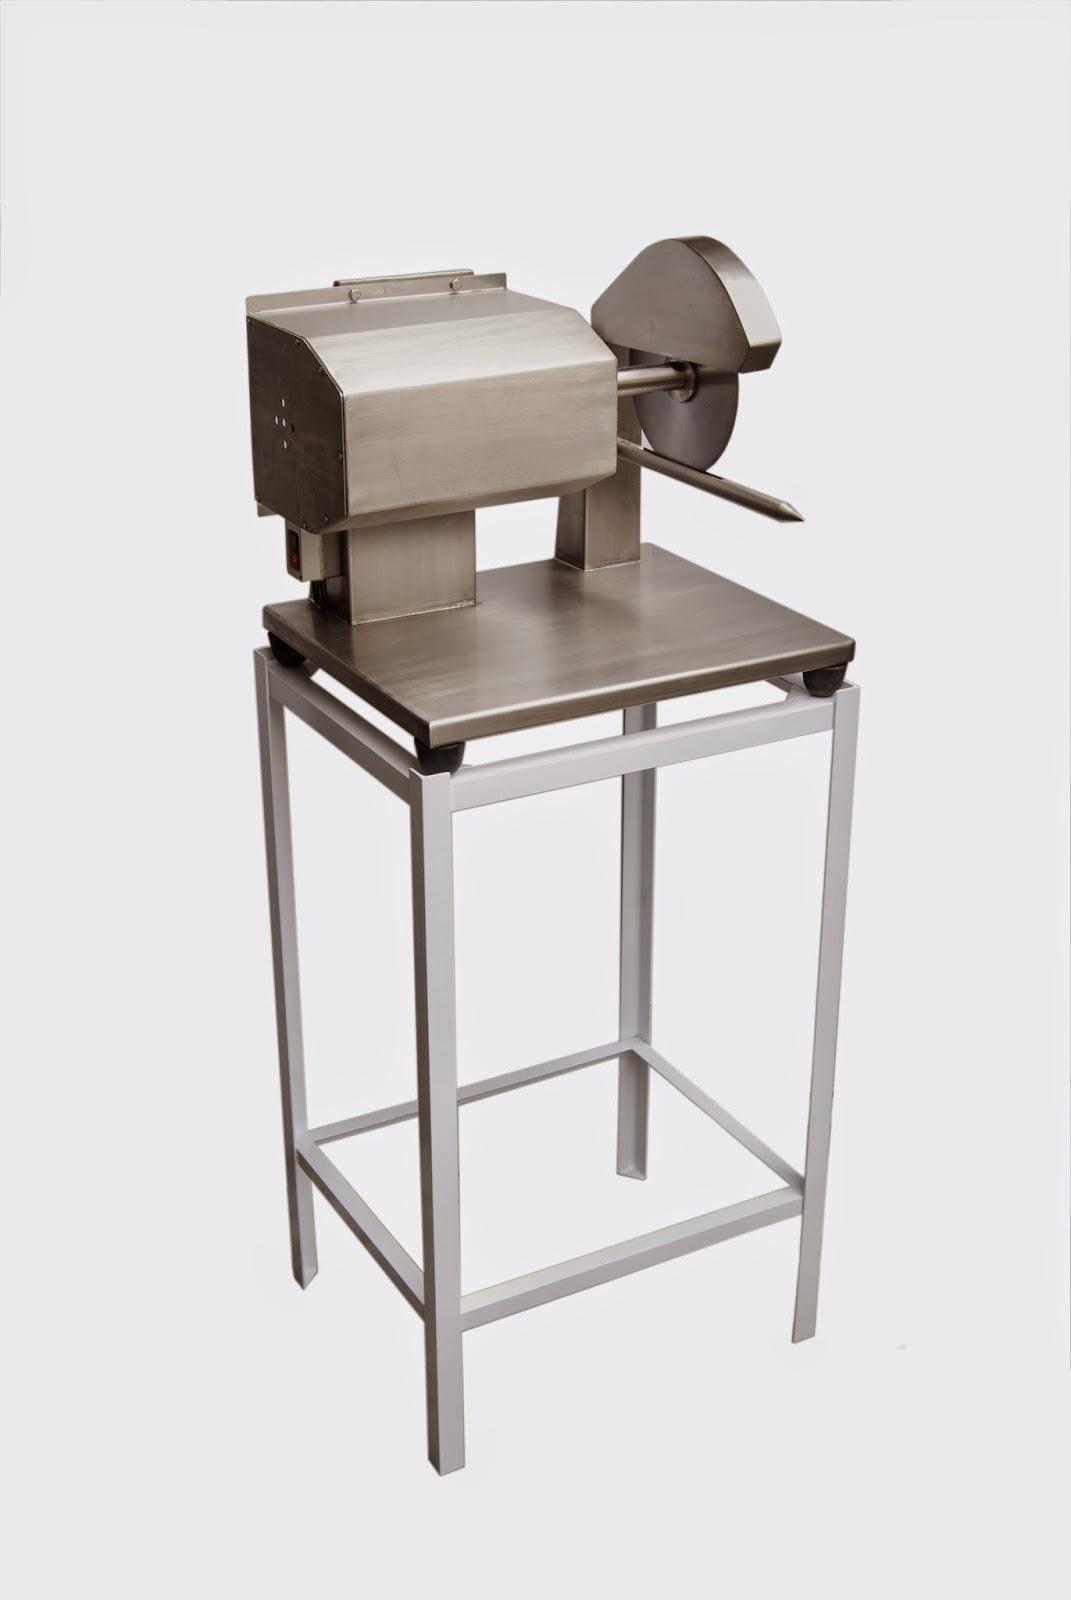 Industrias arizalba maquina despresadora de pollo for Despresadora de pollo